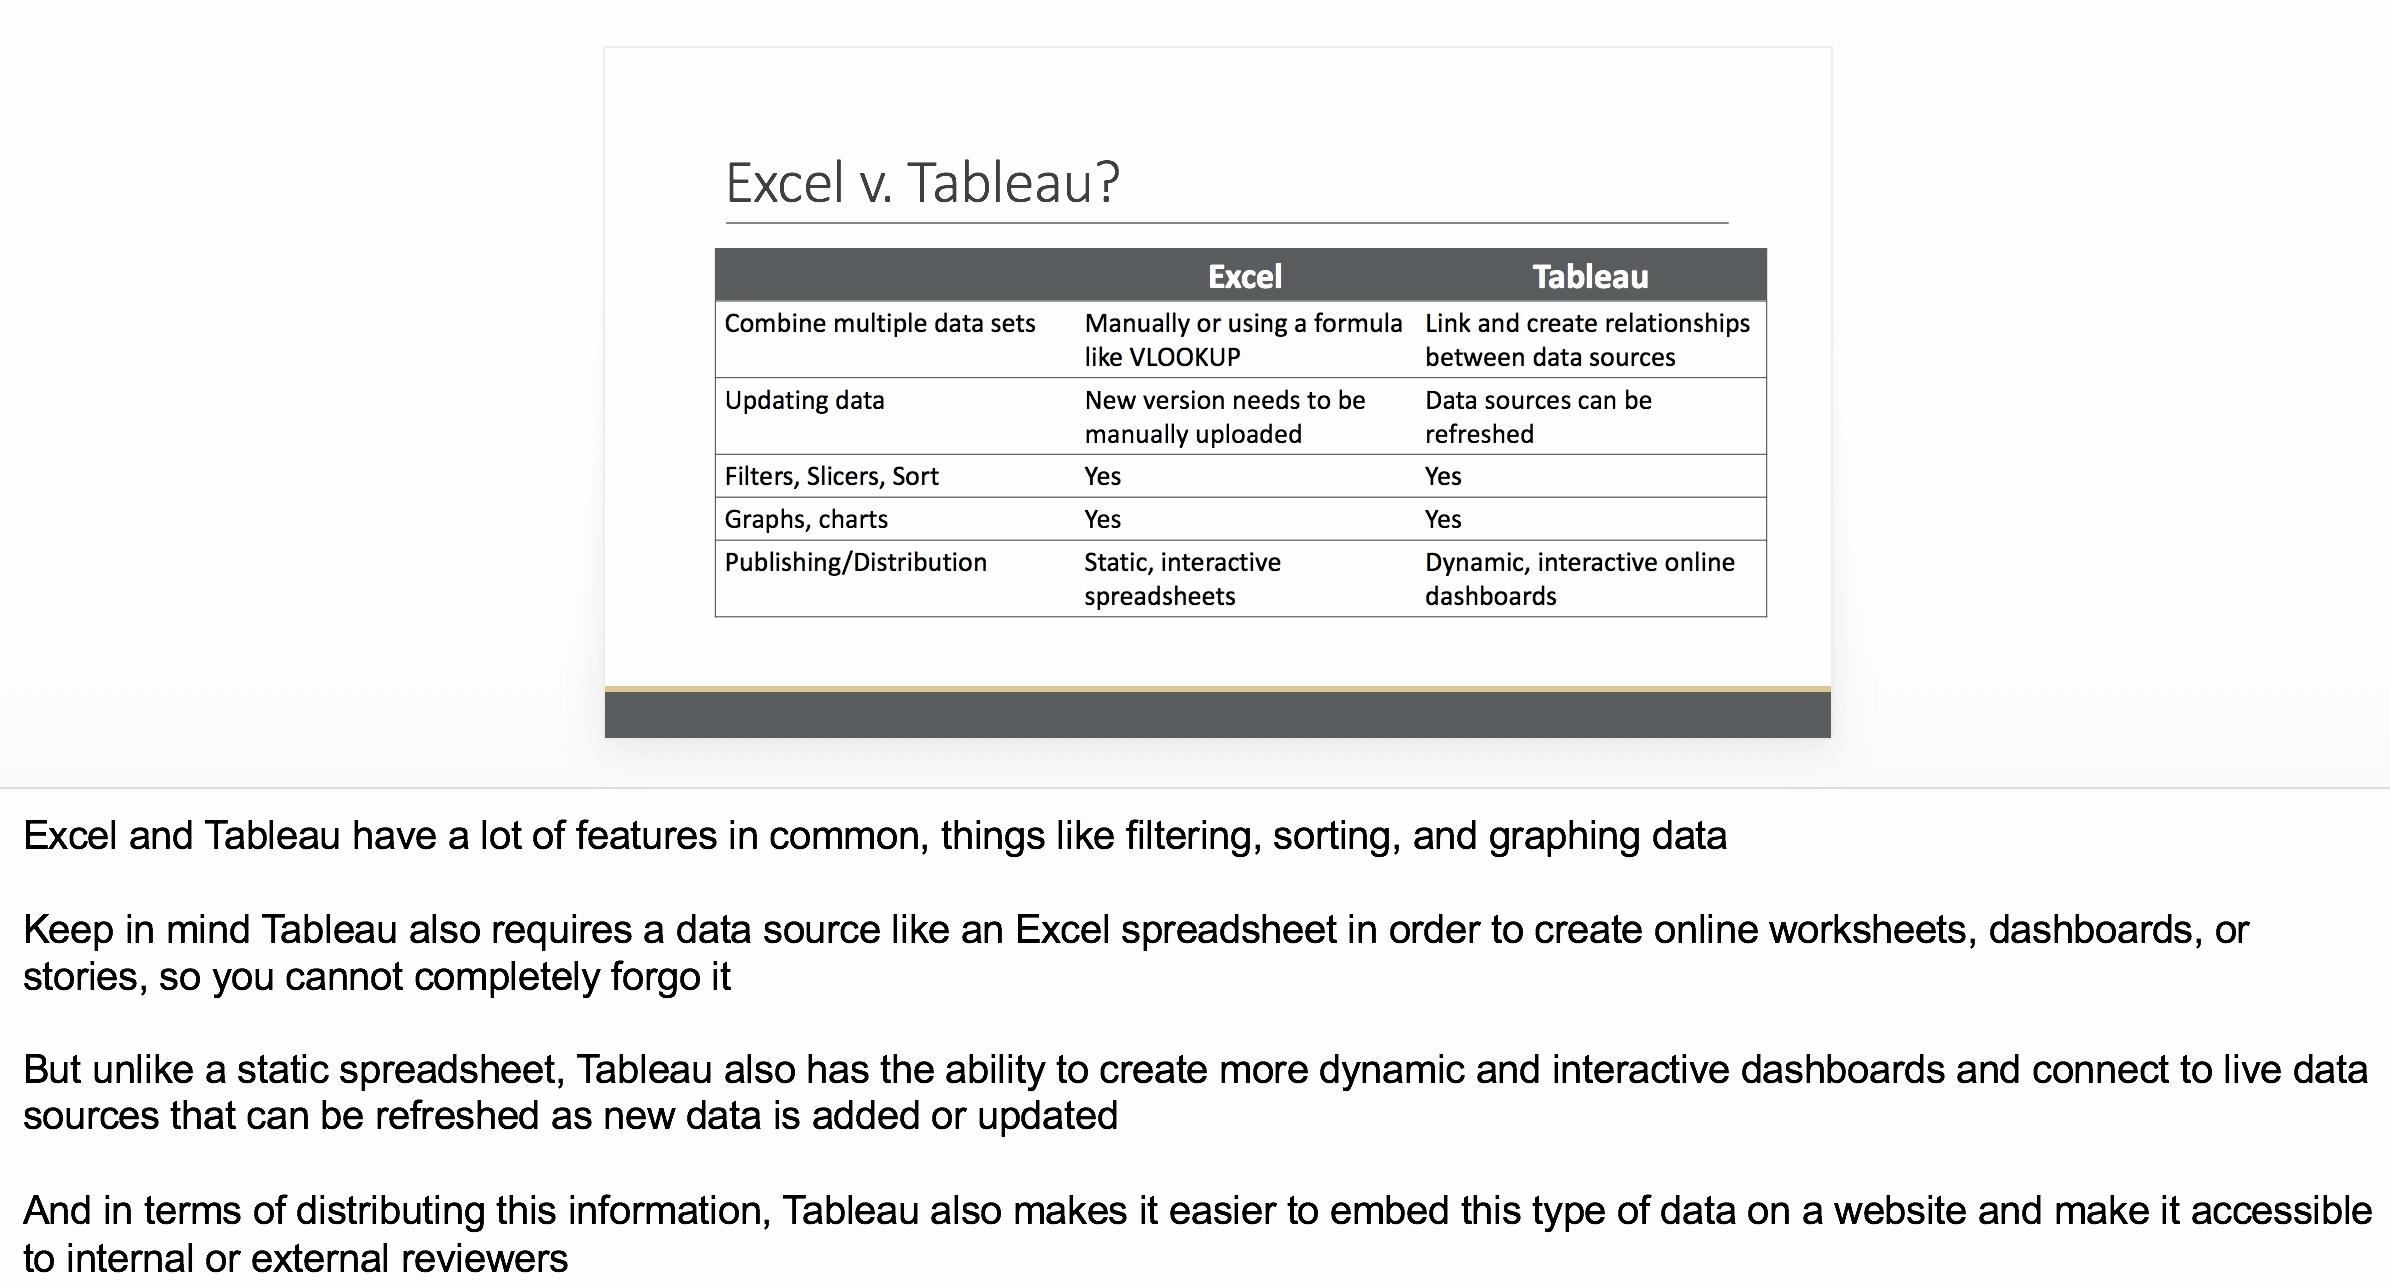 Excel Spreadsheet On Website For Embed Interactive Excel Spreadsheet In Web Page With Plus Google